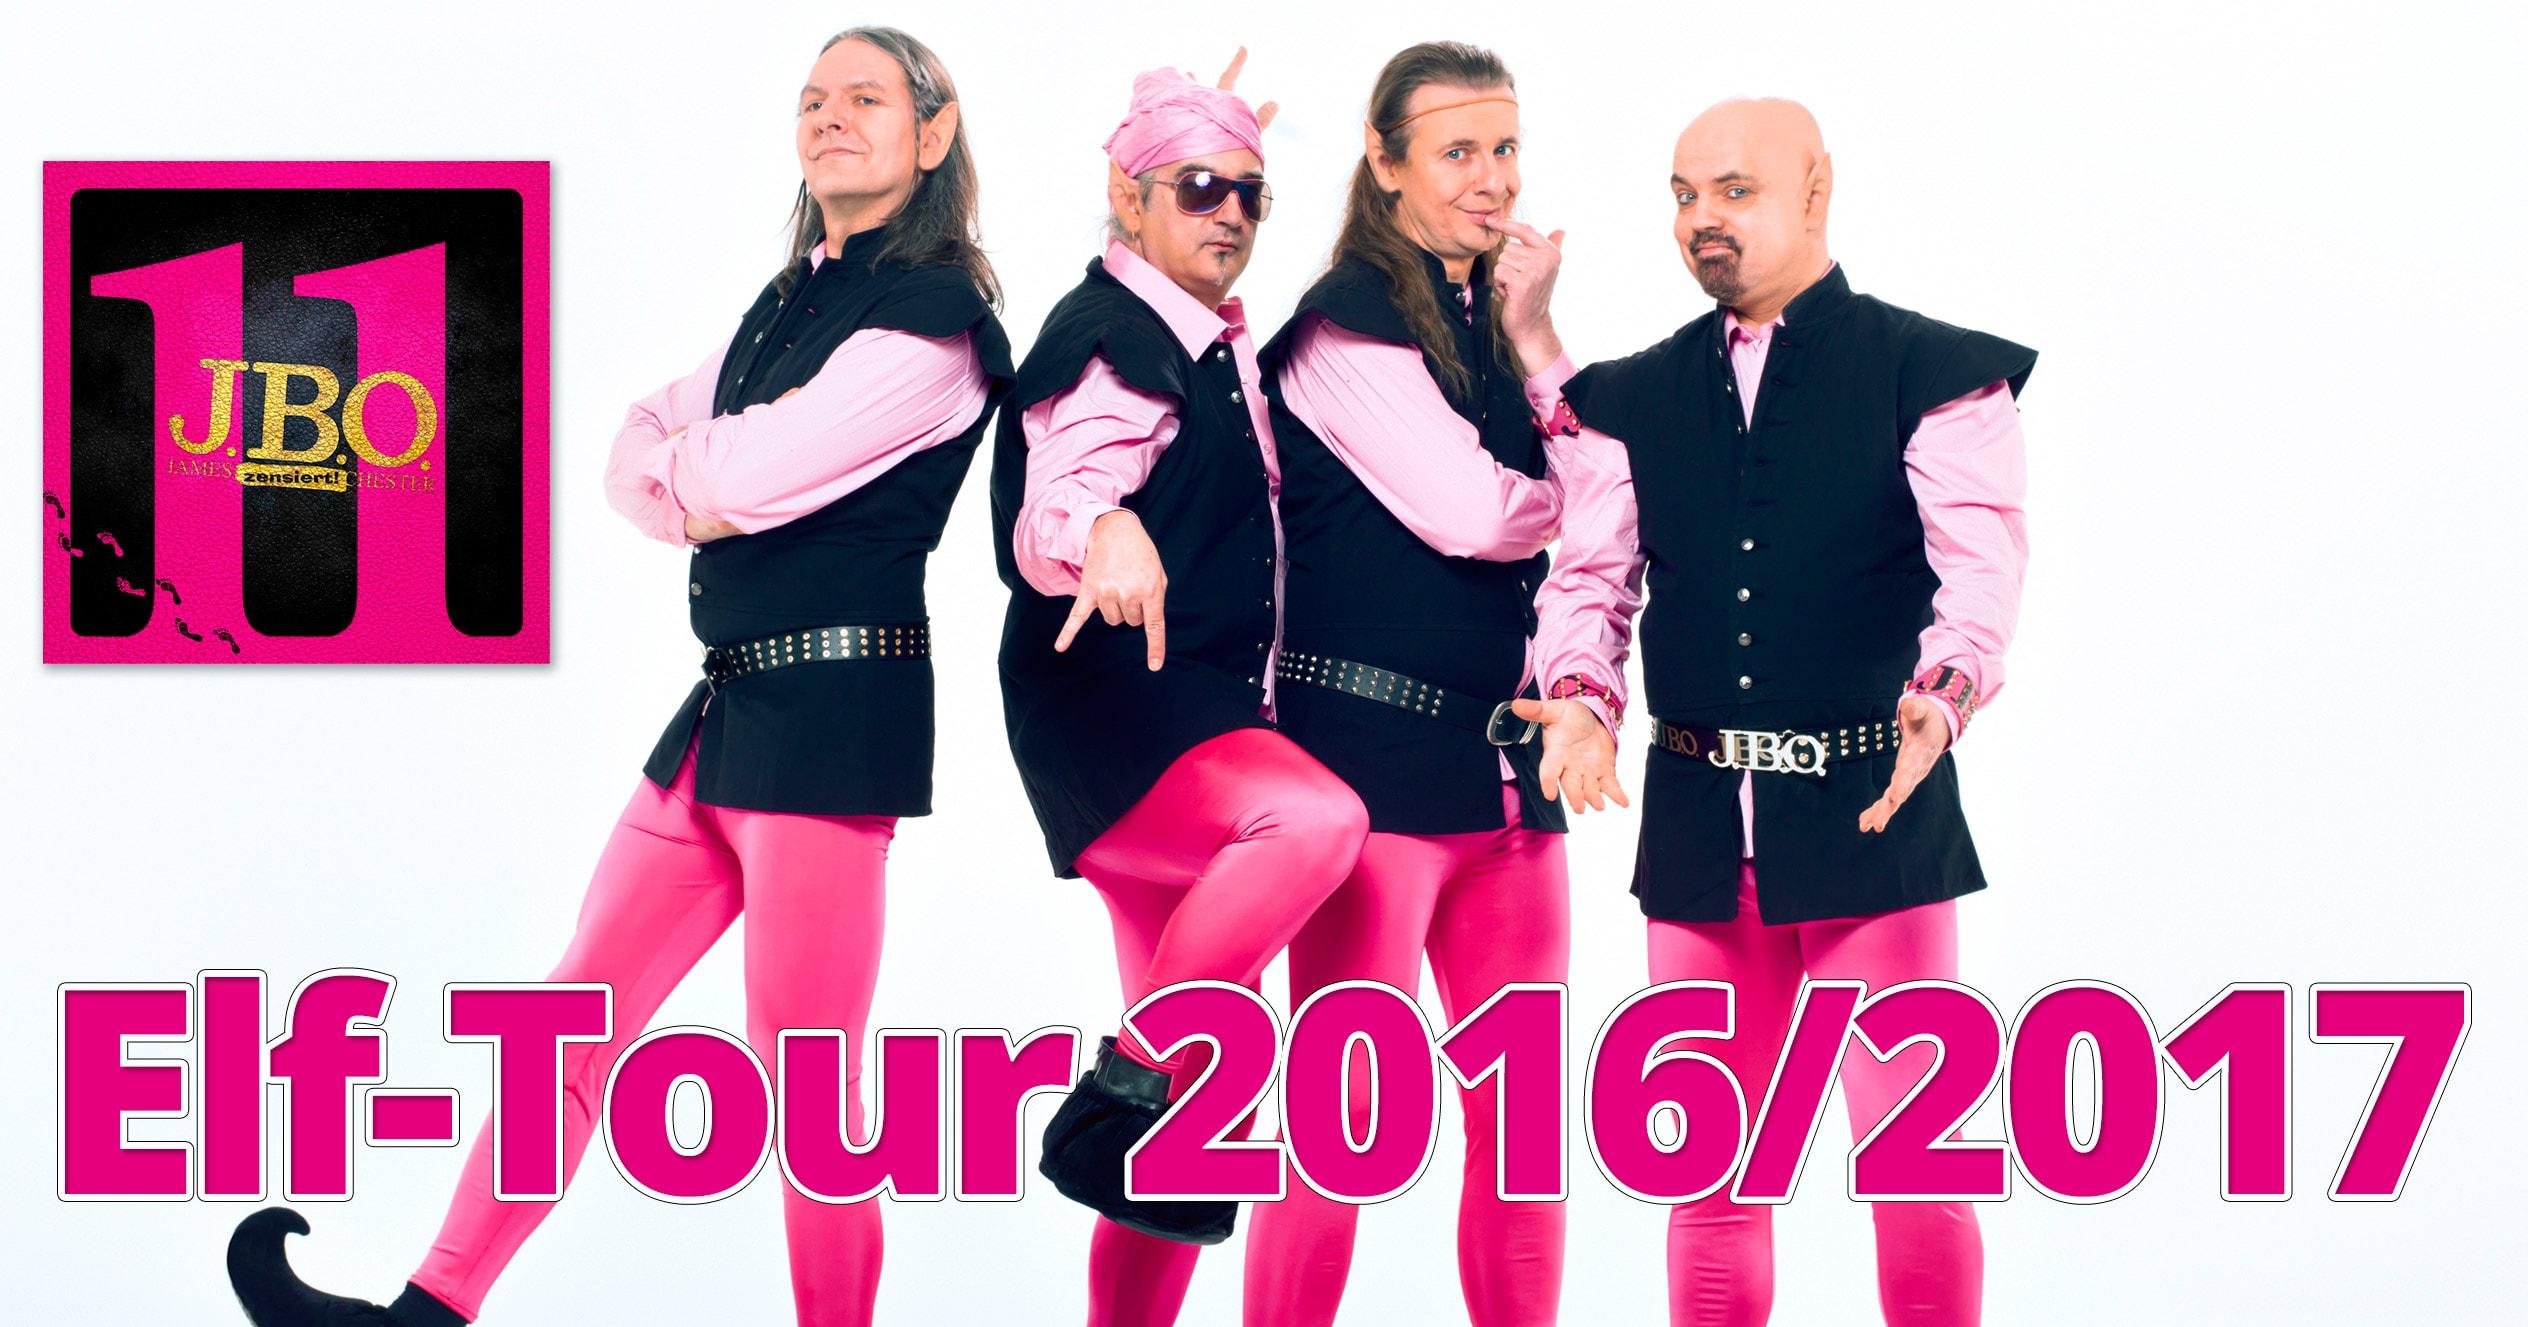 Elf-Tour 2016/2017